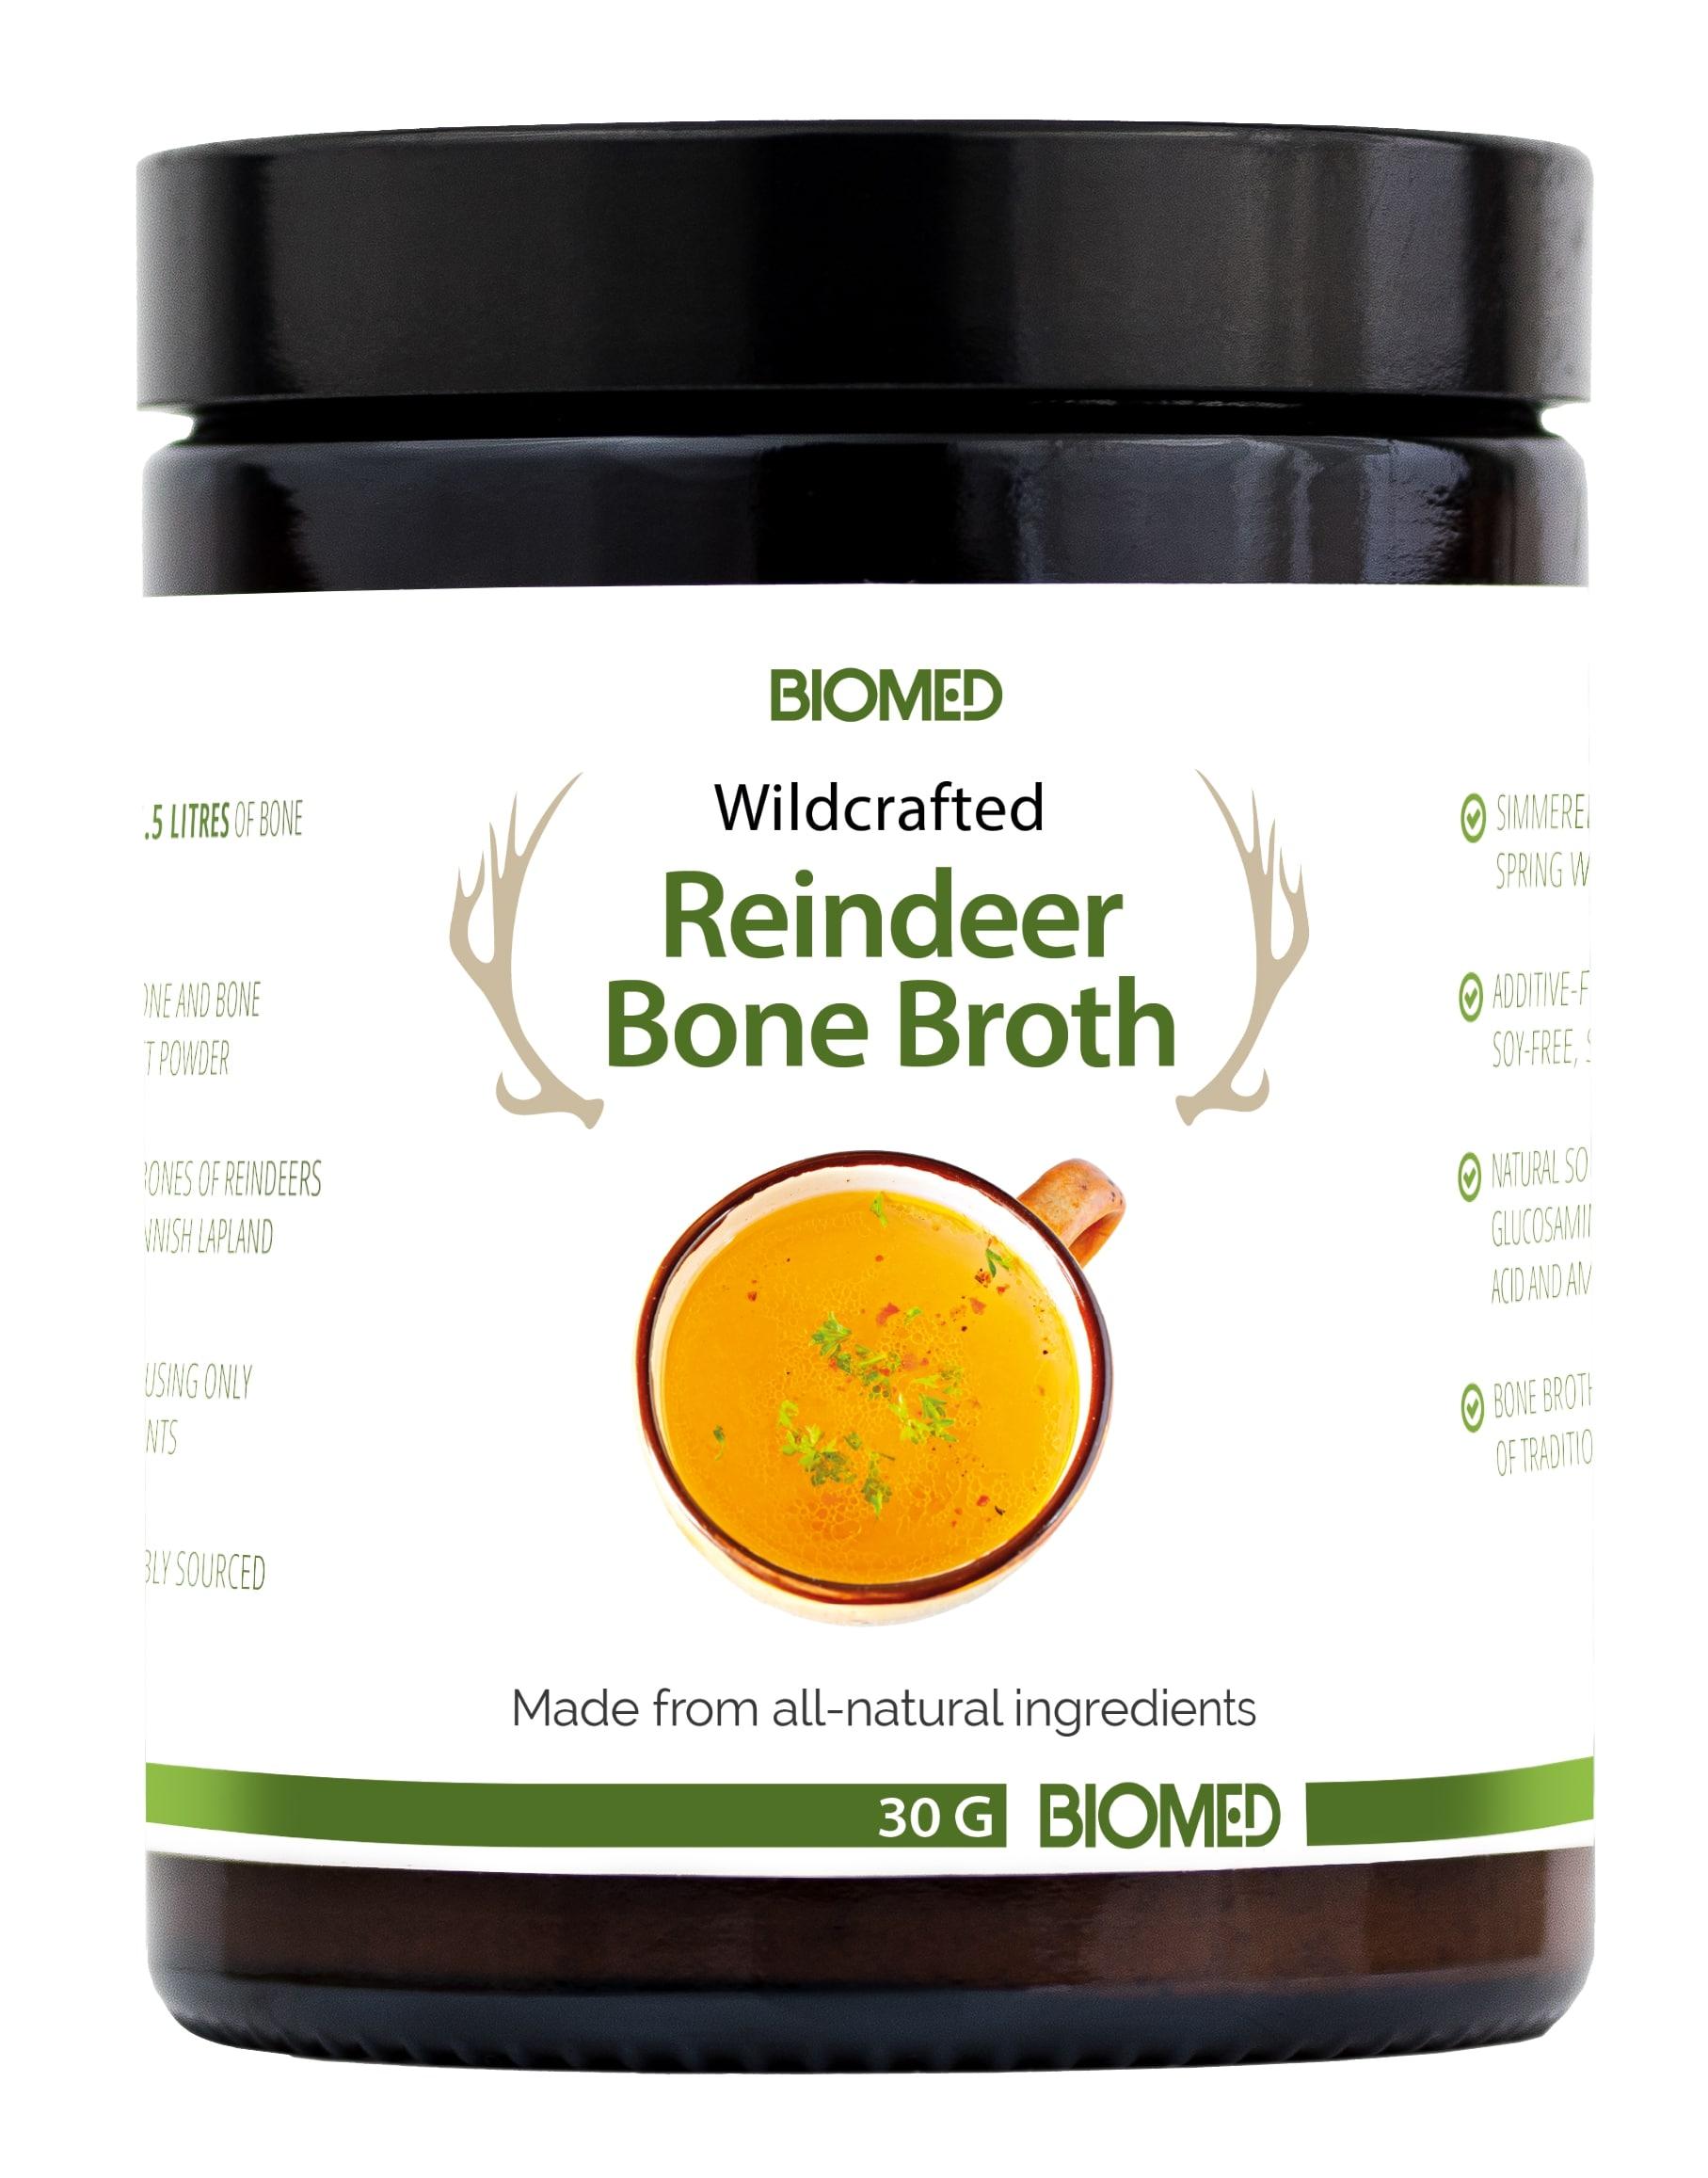 Reindeer Bone Broth 30g